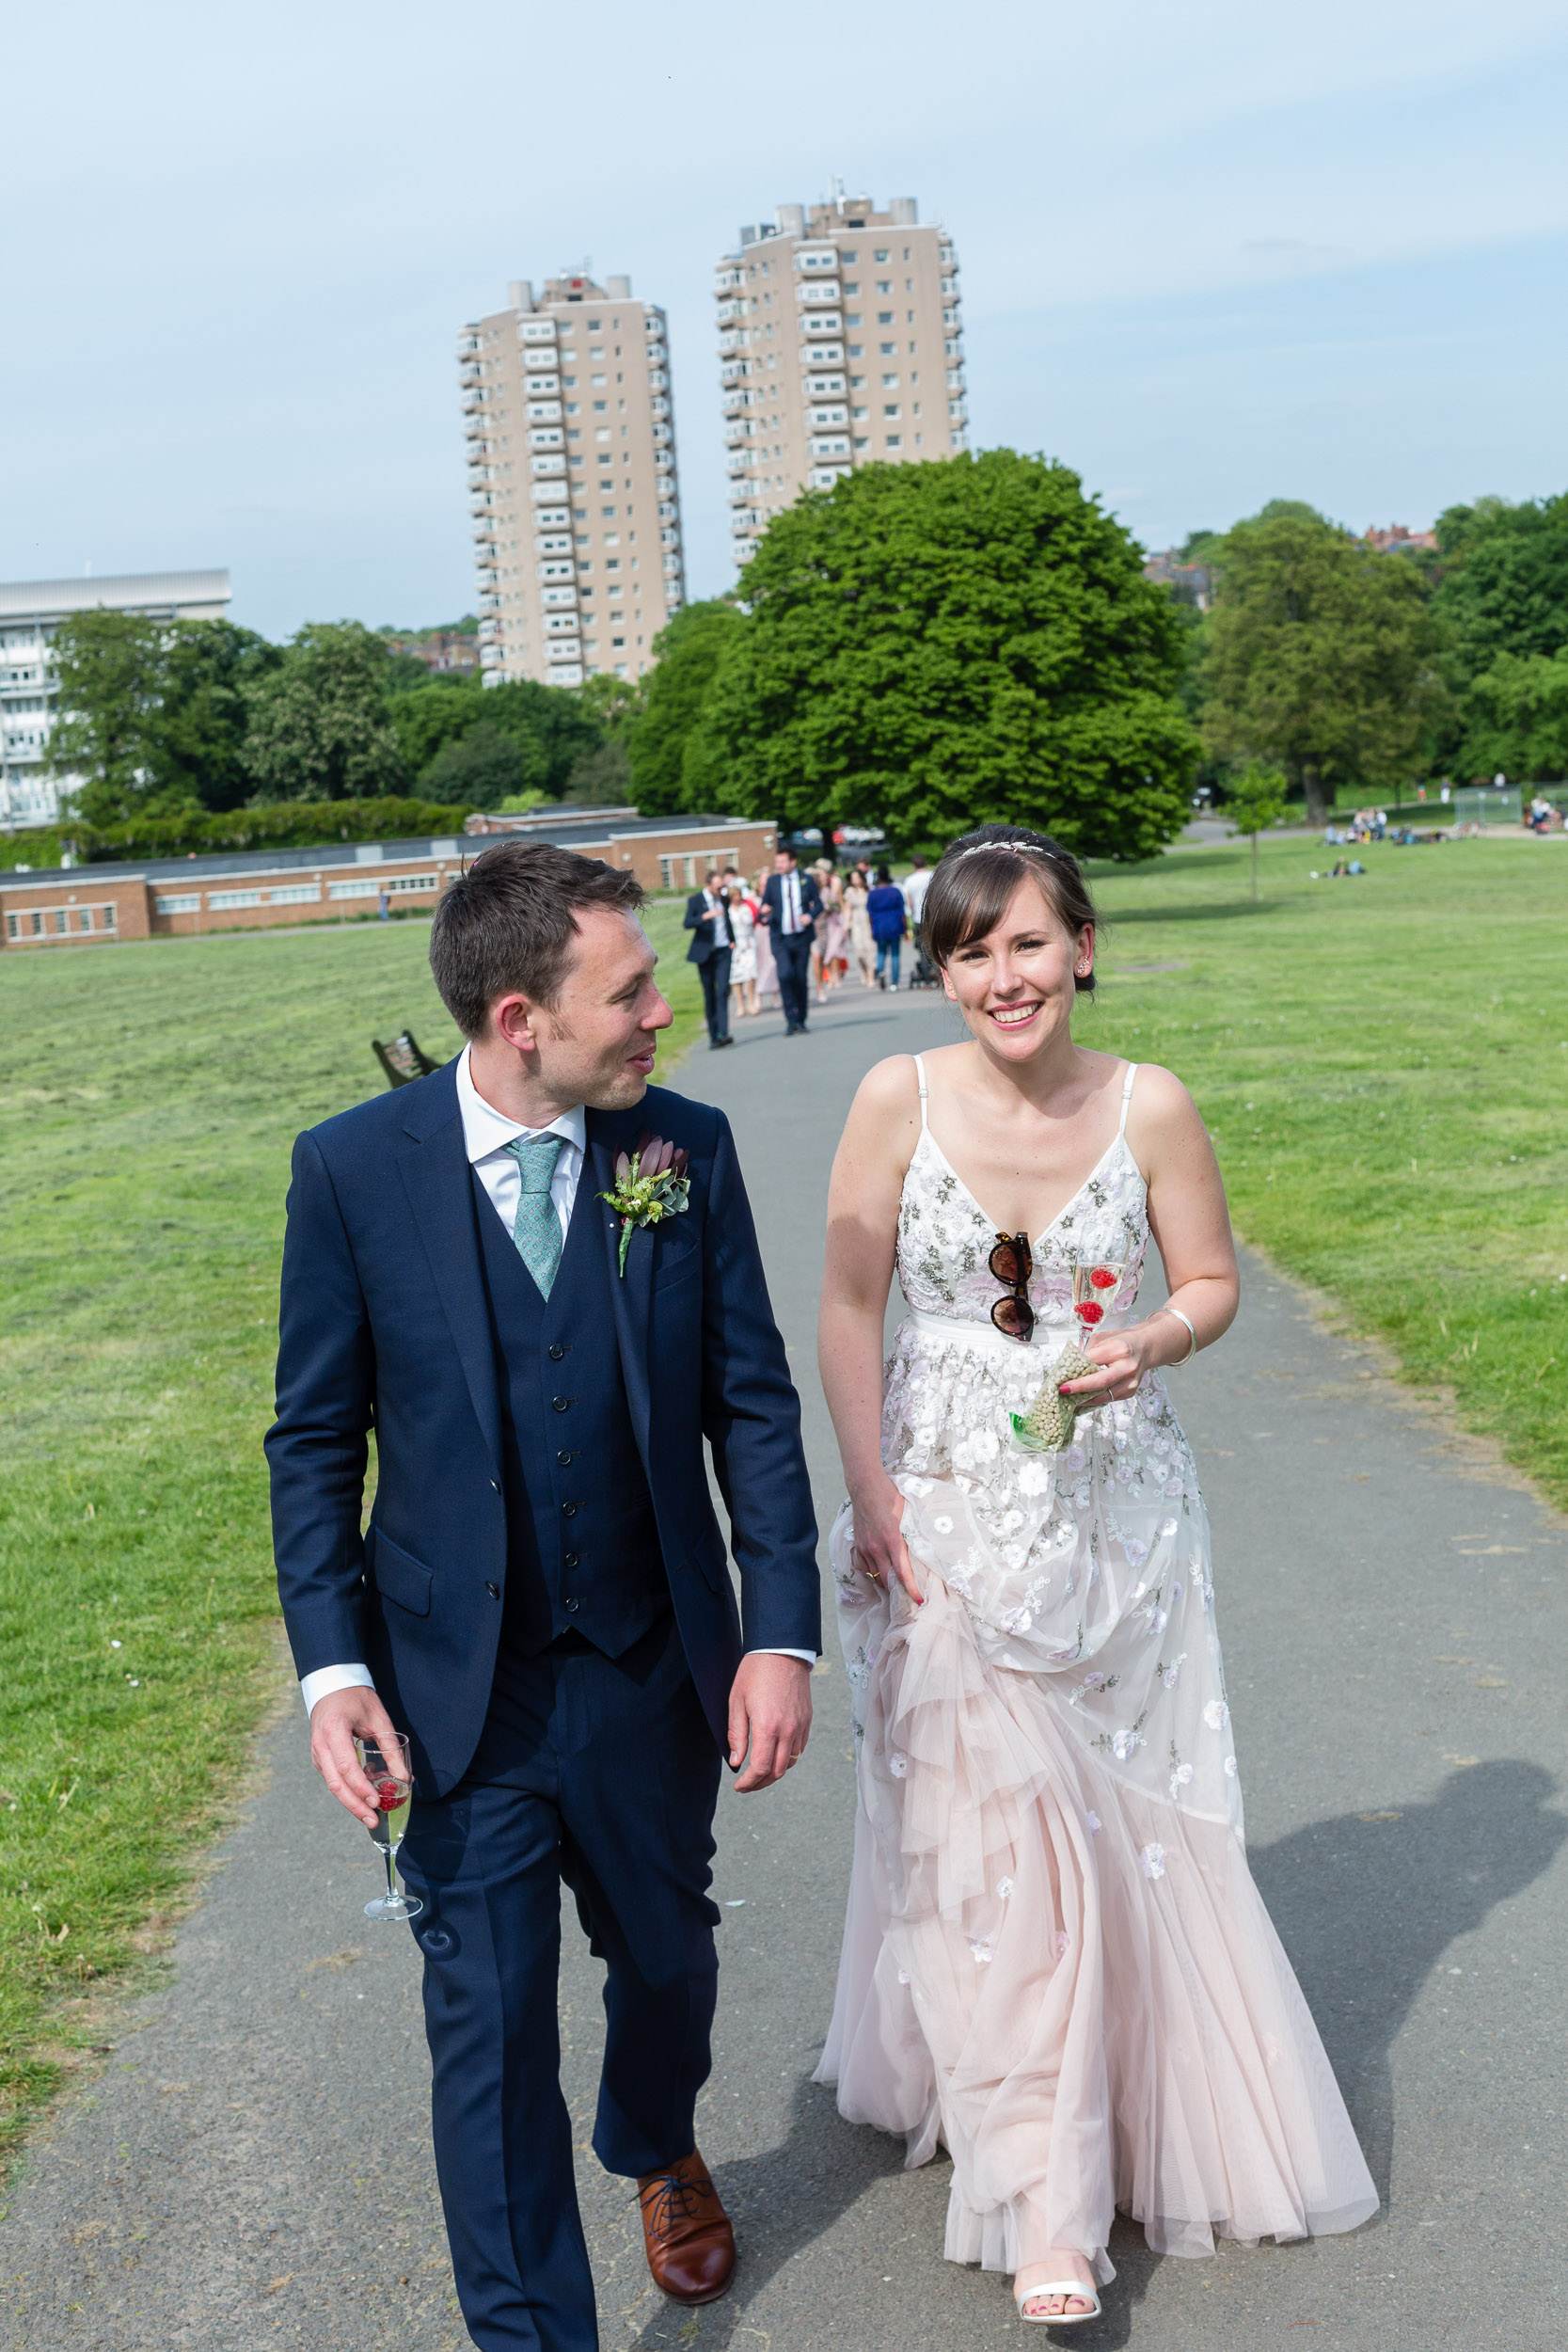 brockwell-lido-brixton-herne-hill-wedding-250.jpg